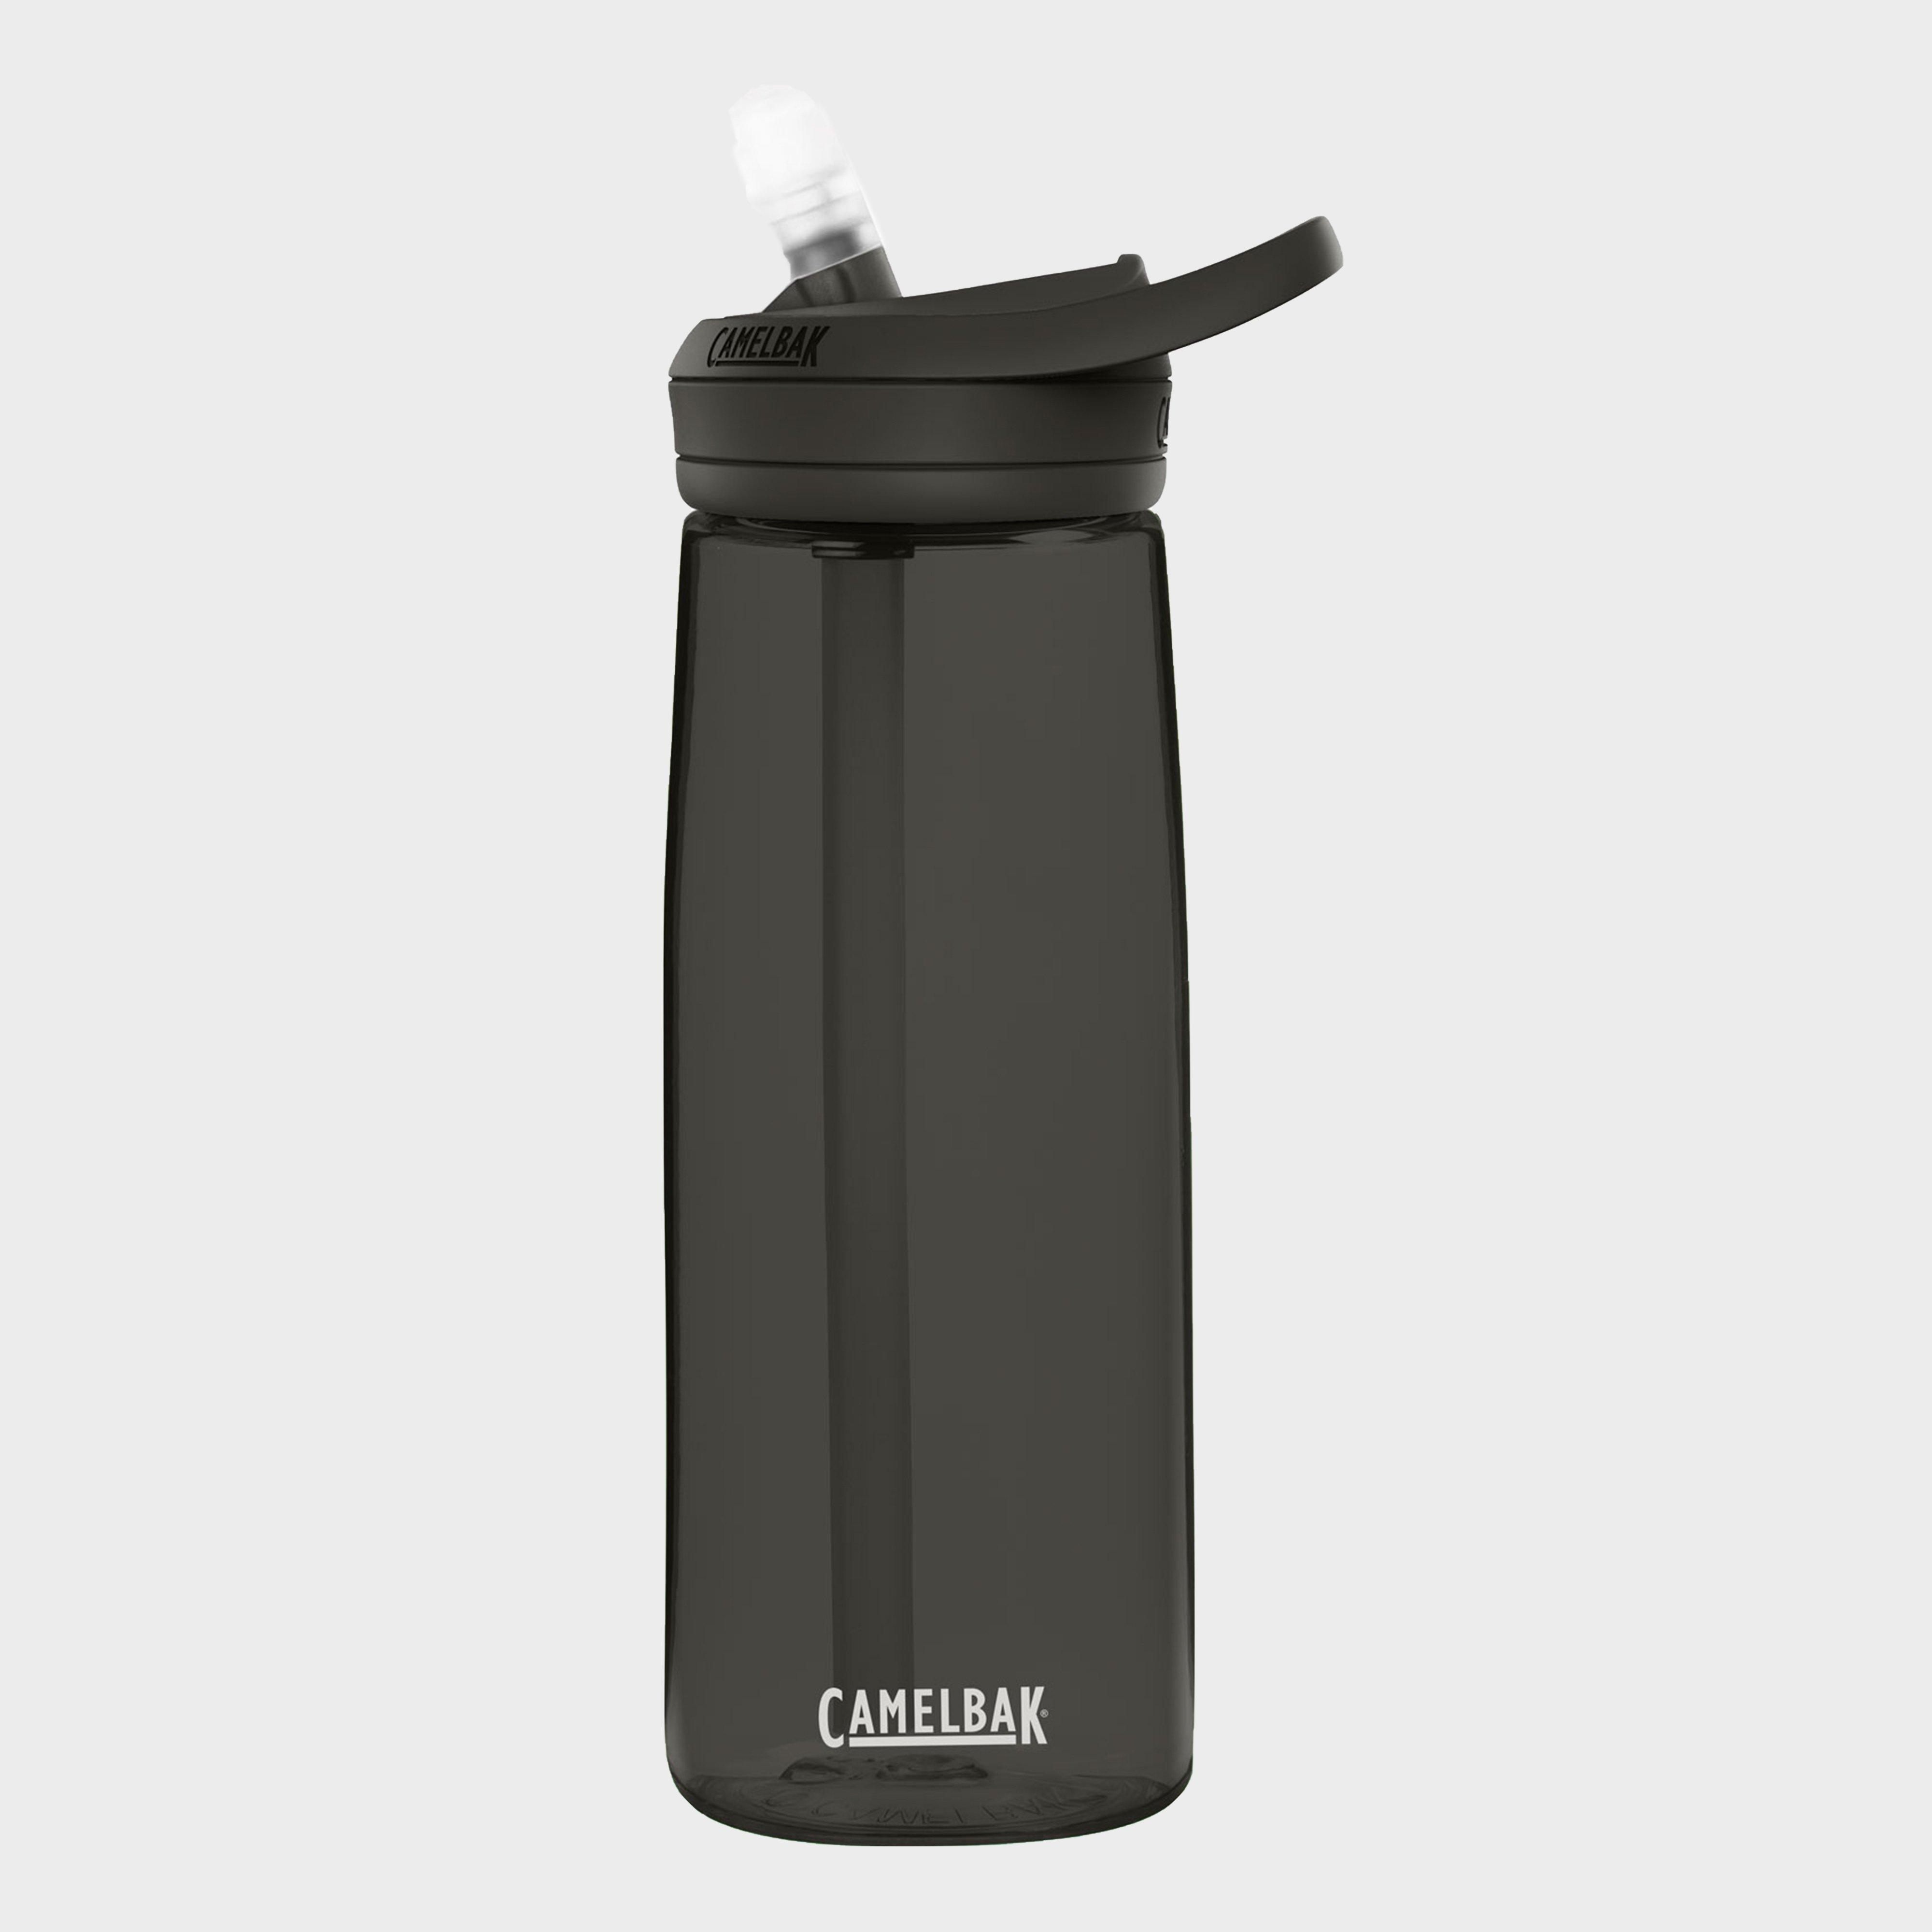 Camelbak Eddy + 0.6L Bottle, Black/0.75L